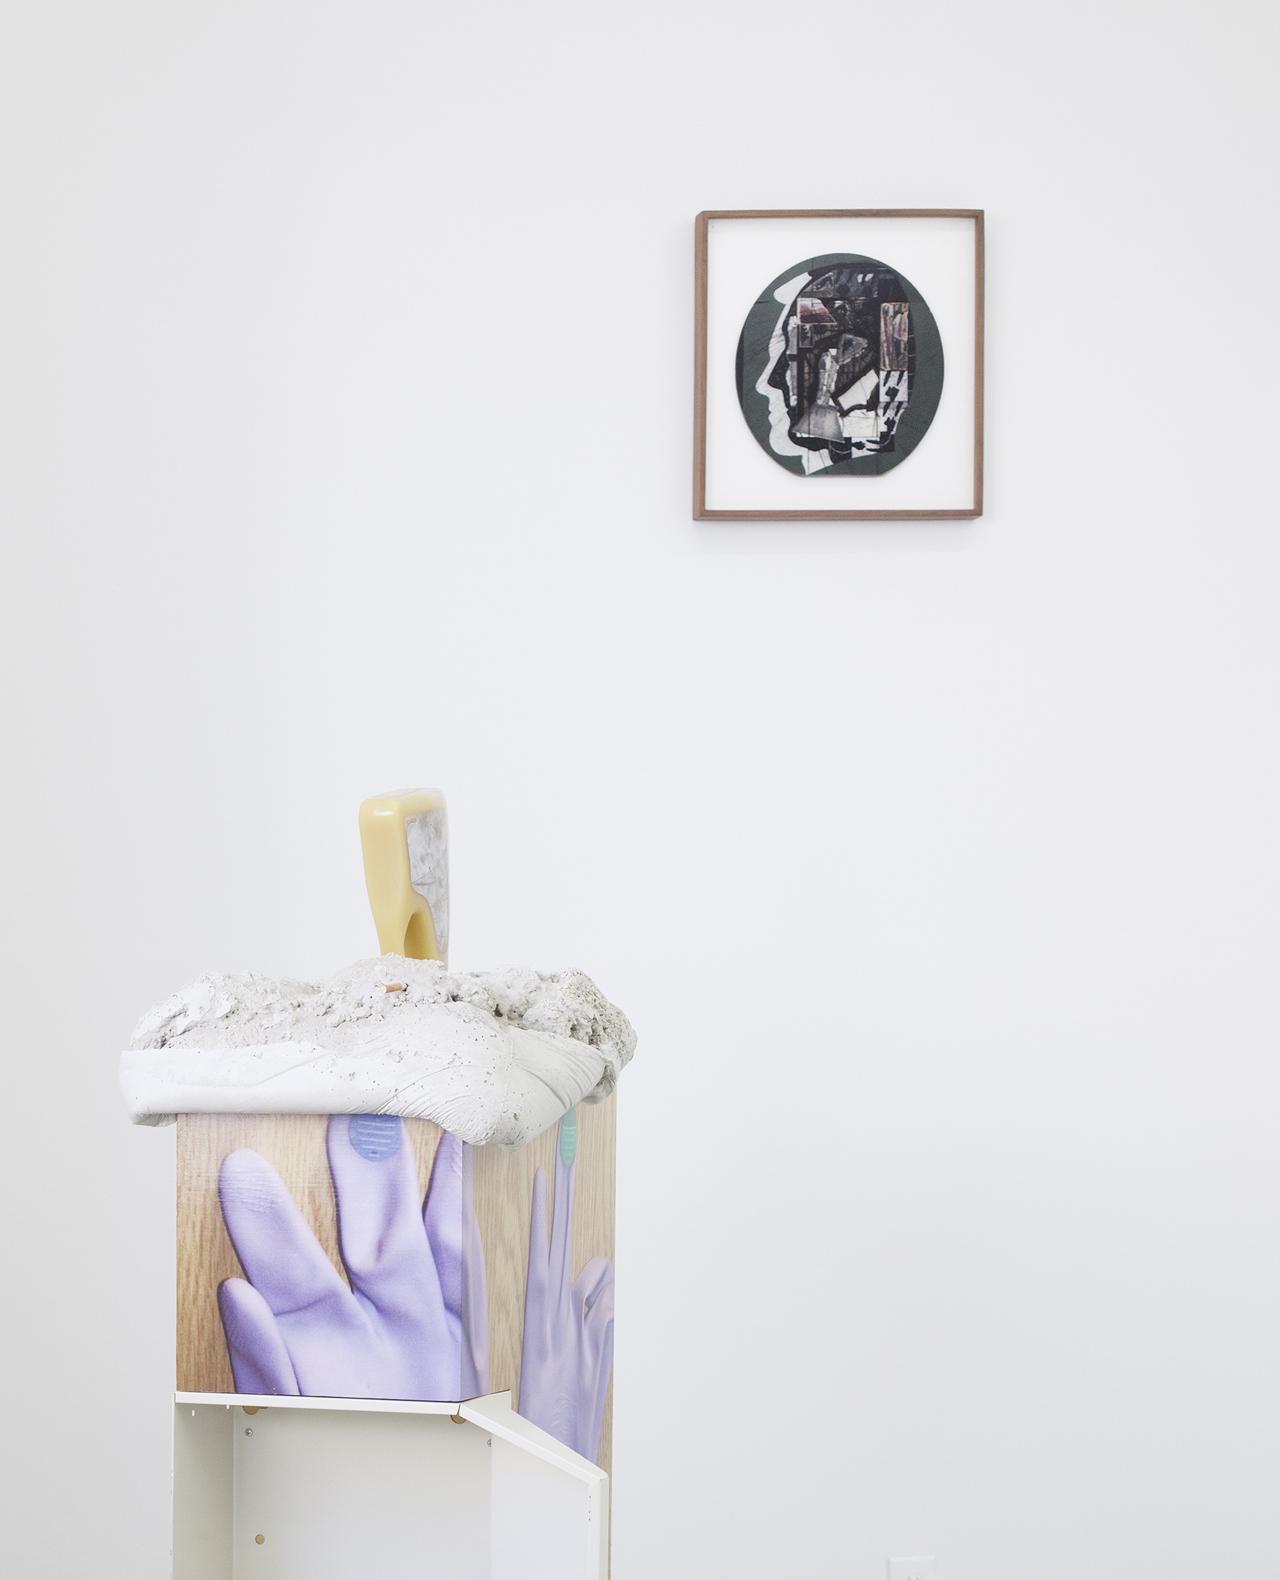 "Installation view of 'Umpawaug's Bloom' at Kimberly-Klark with Ray Johnson, ""Untitled (Tab Hunter William Burroughs)"" (1976–81) (© Ray Johnson Estate, Courtesy Richard L. Feigen & Co.)"